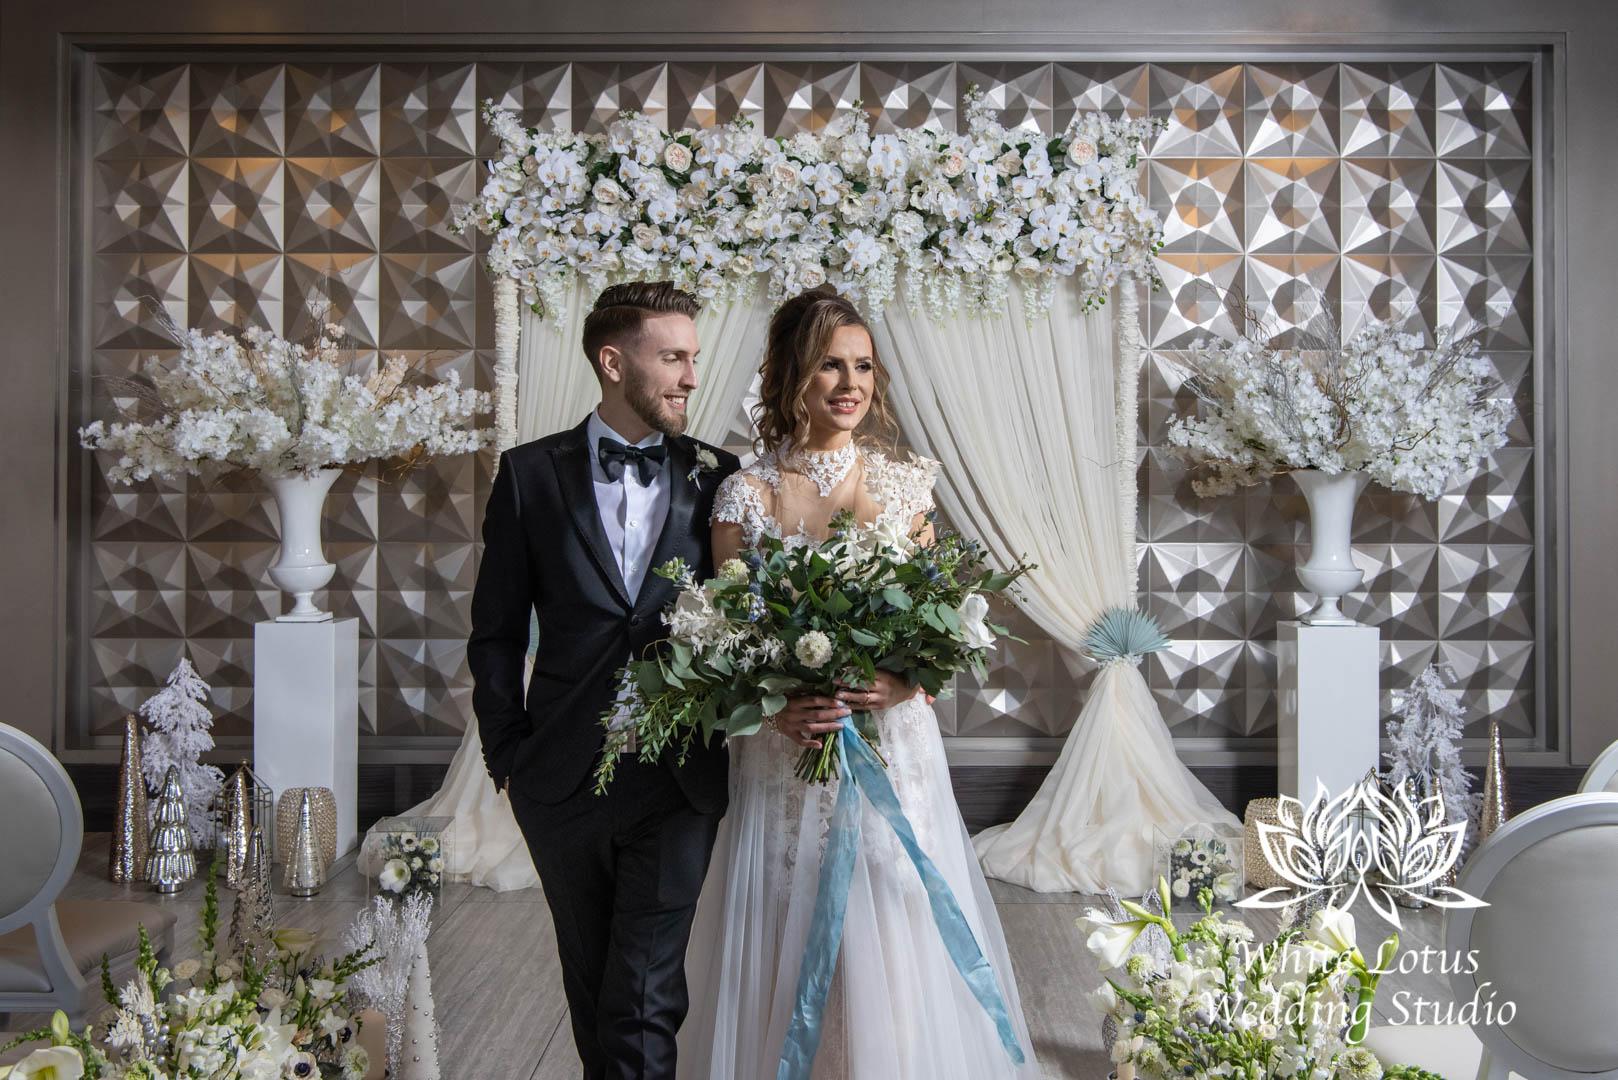 048- GLAM WINTERLUXE WEDDING INSPIRATION